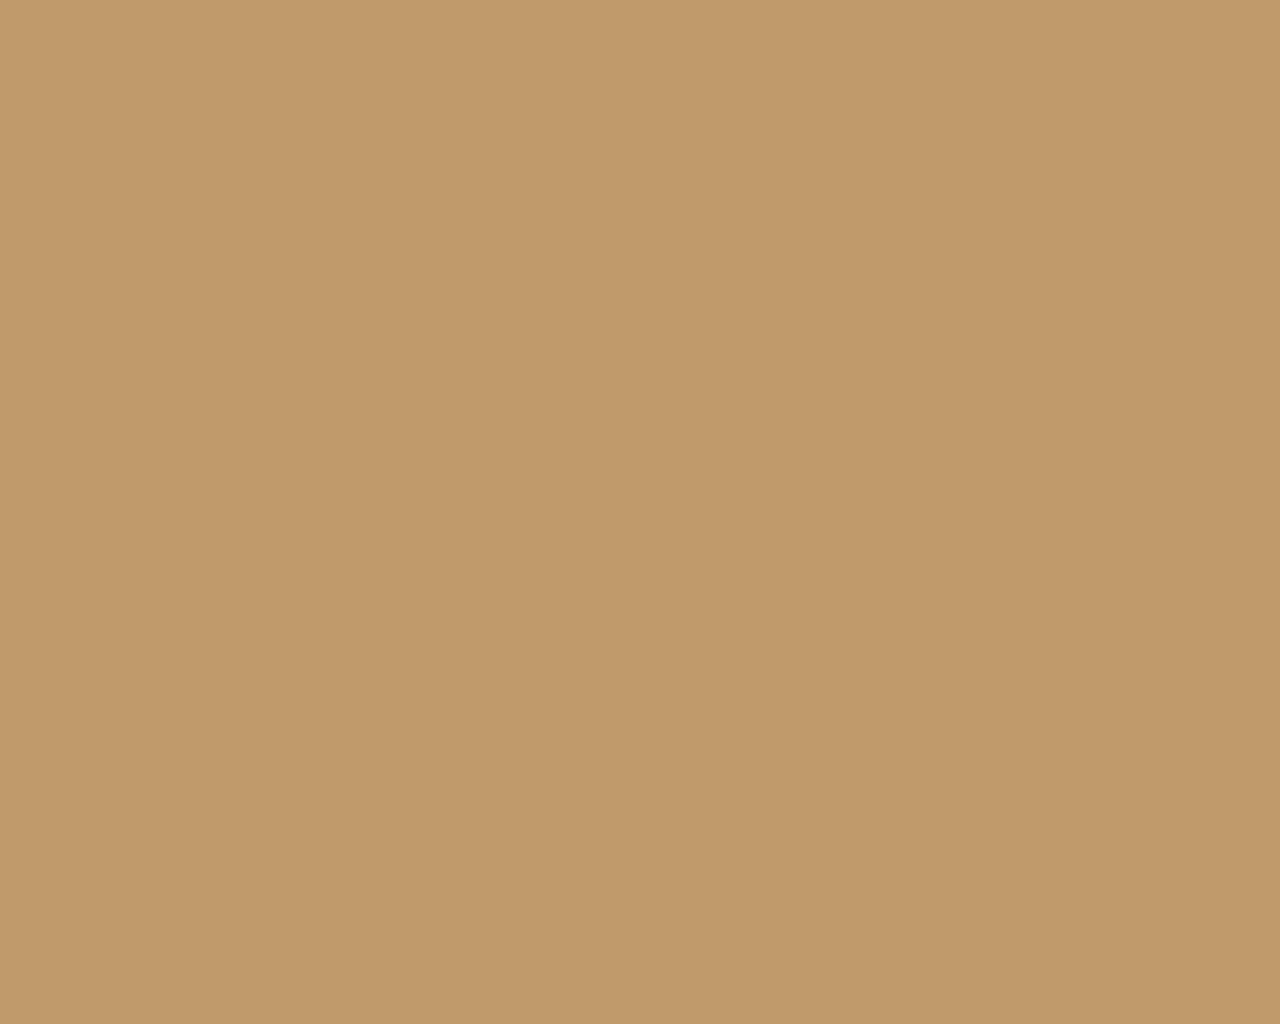 1280x1024 Camel Solid Color Background